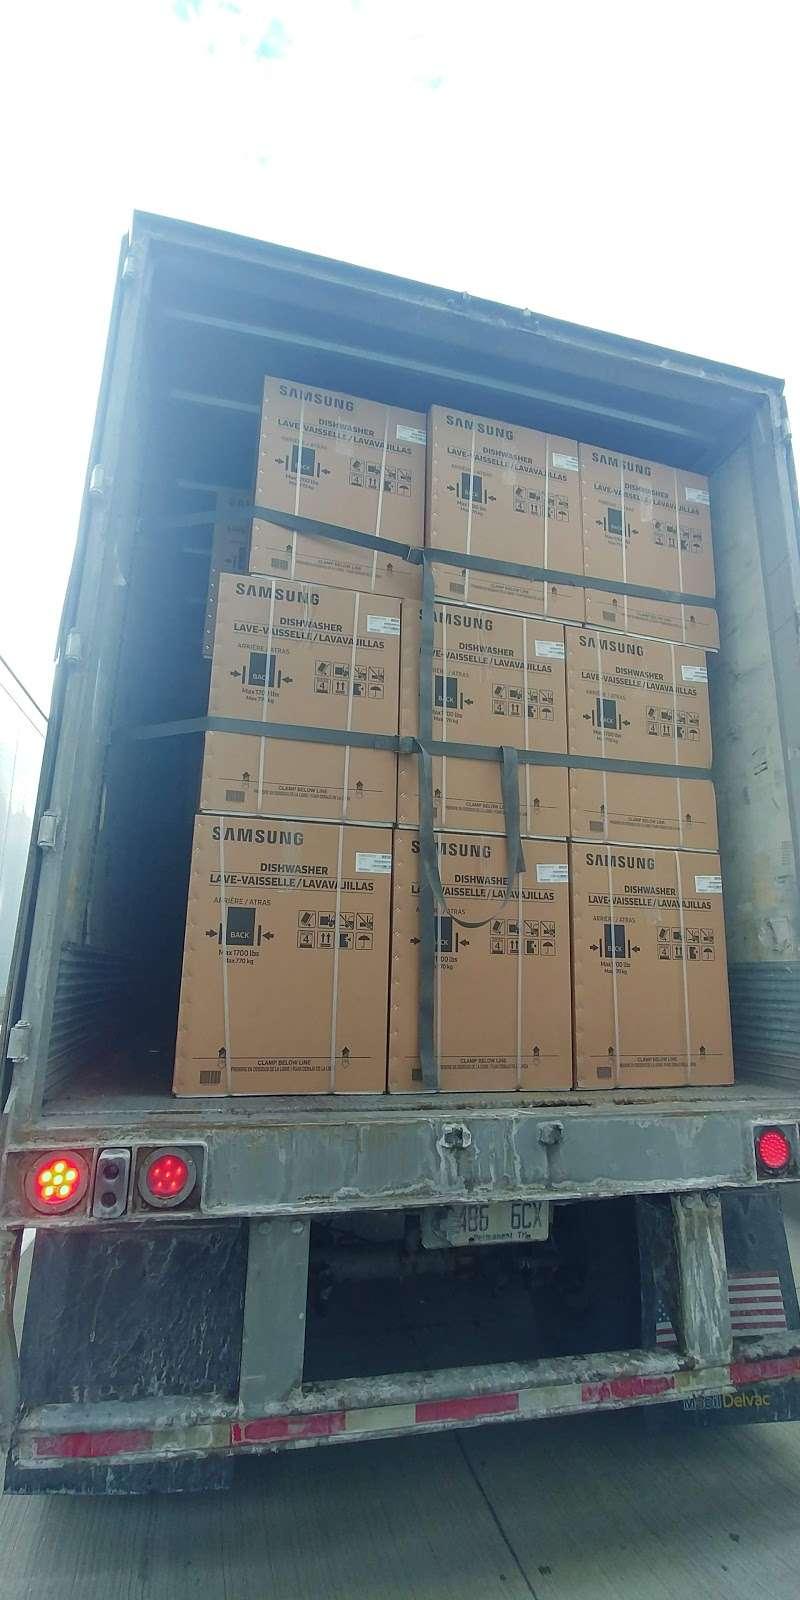 Samsung Distribution Center - storage  | Photo 3 of 3 | Address: 41 Martha Dr, Bethel, PA 19507, USA | Phone: (214) 959-5969